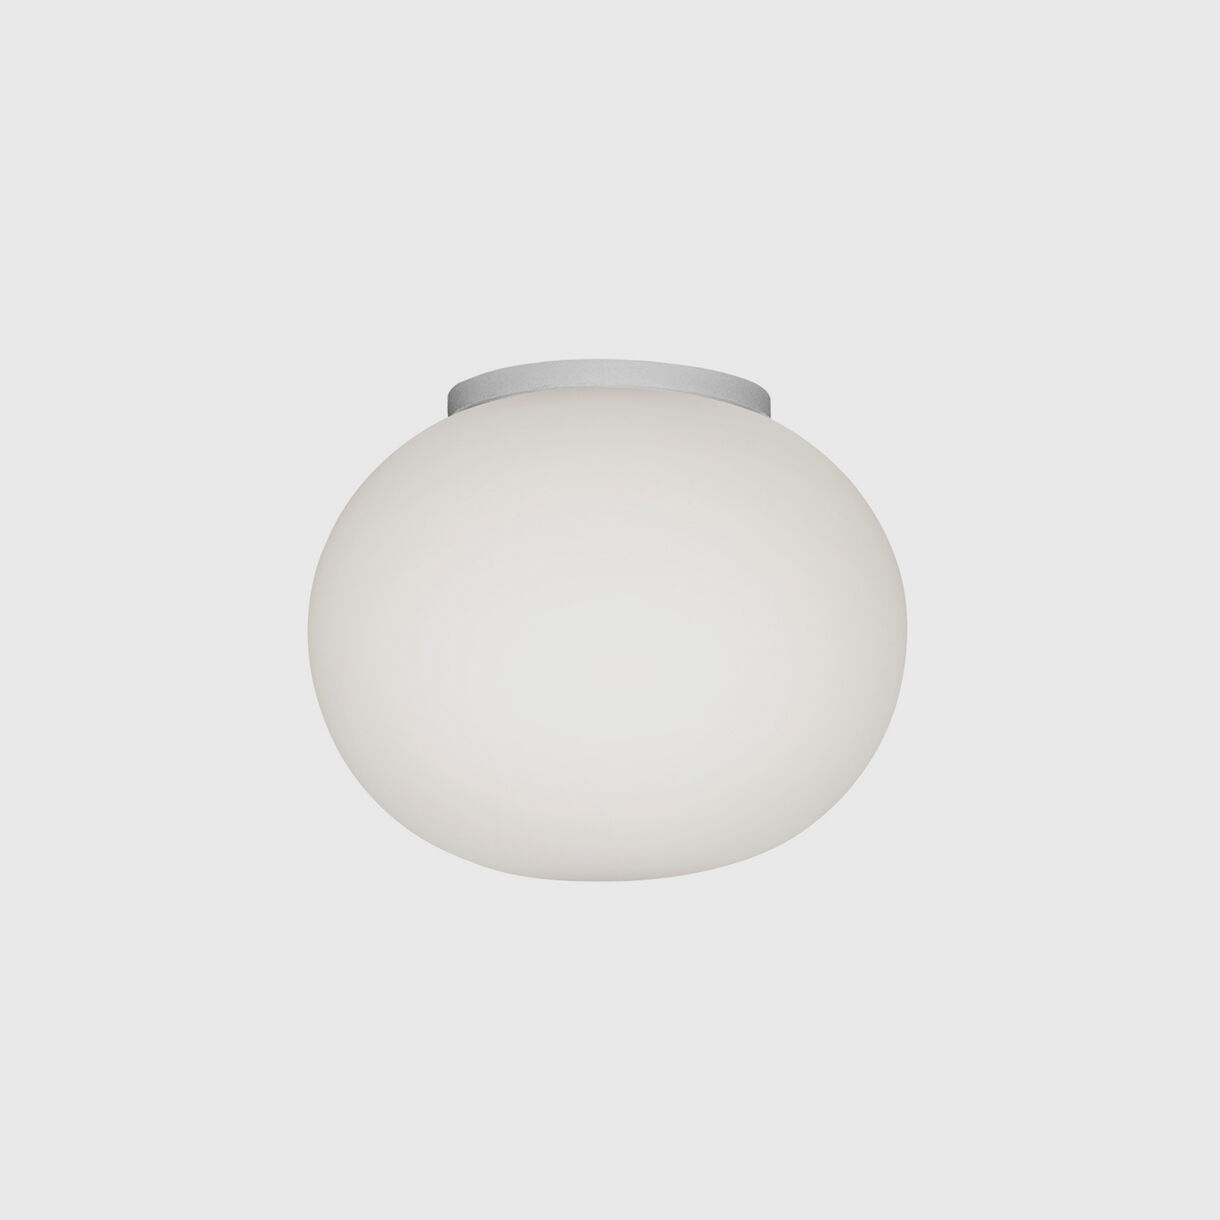 Mini Glo-Ball, Ceiling & Wall, On